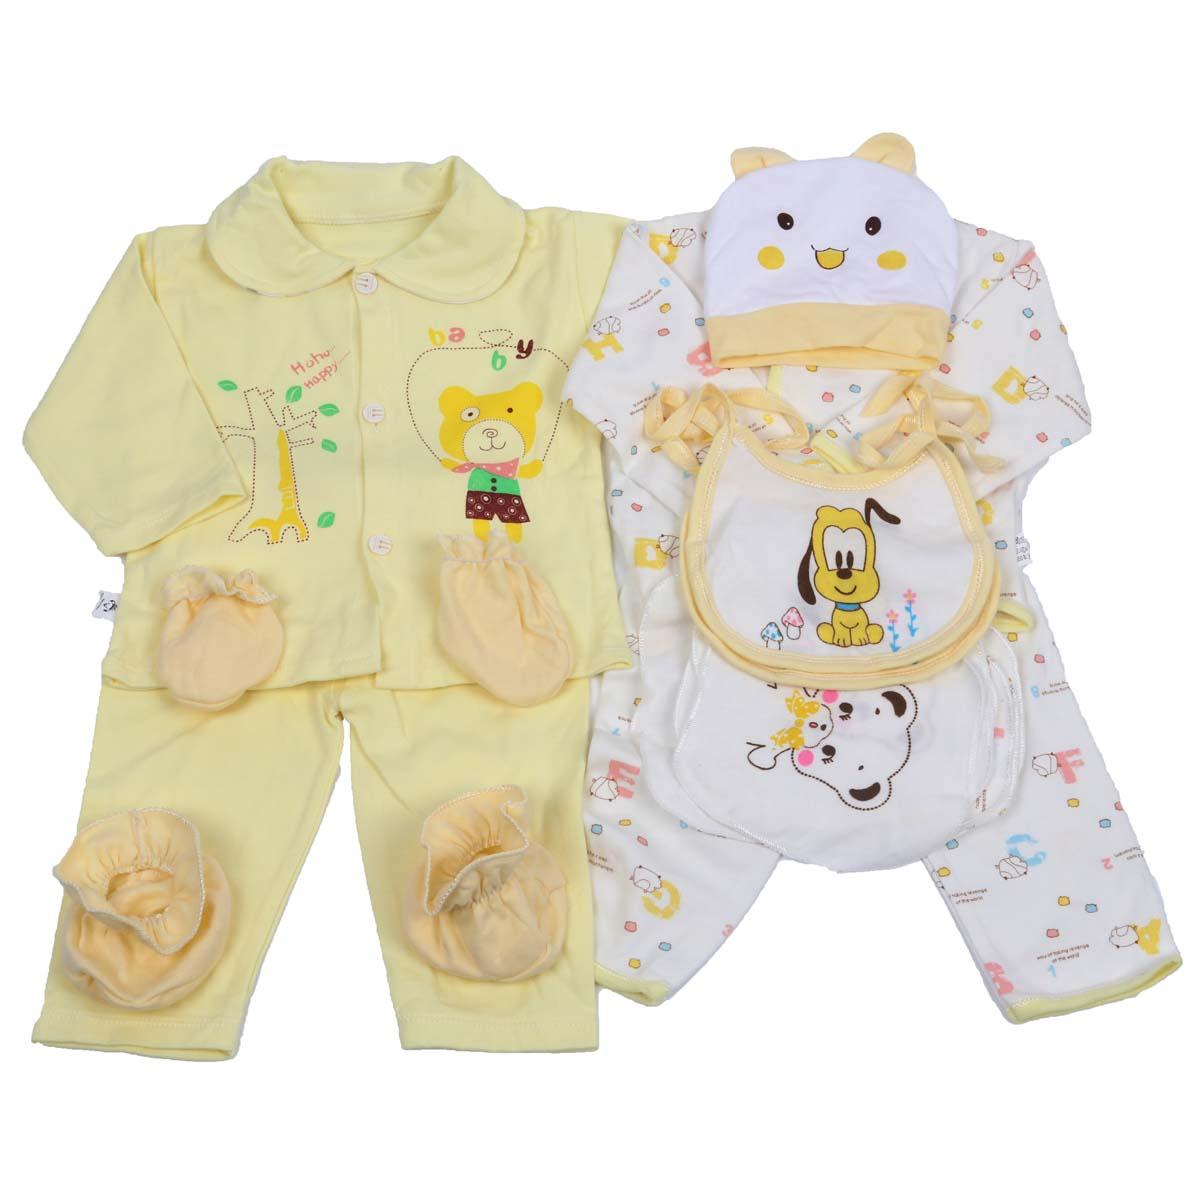 da0537ae7 18pcs set Newborn Baby Clothes Girls Boys Clothing Set Cute infant ...